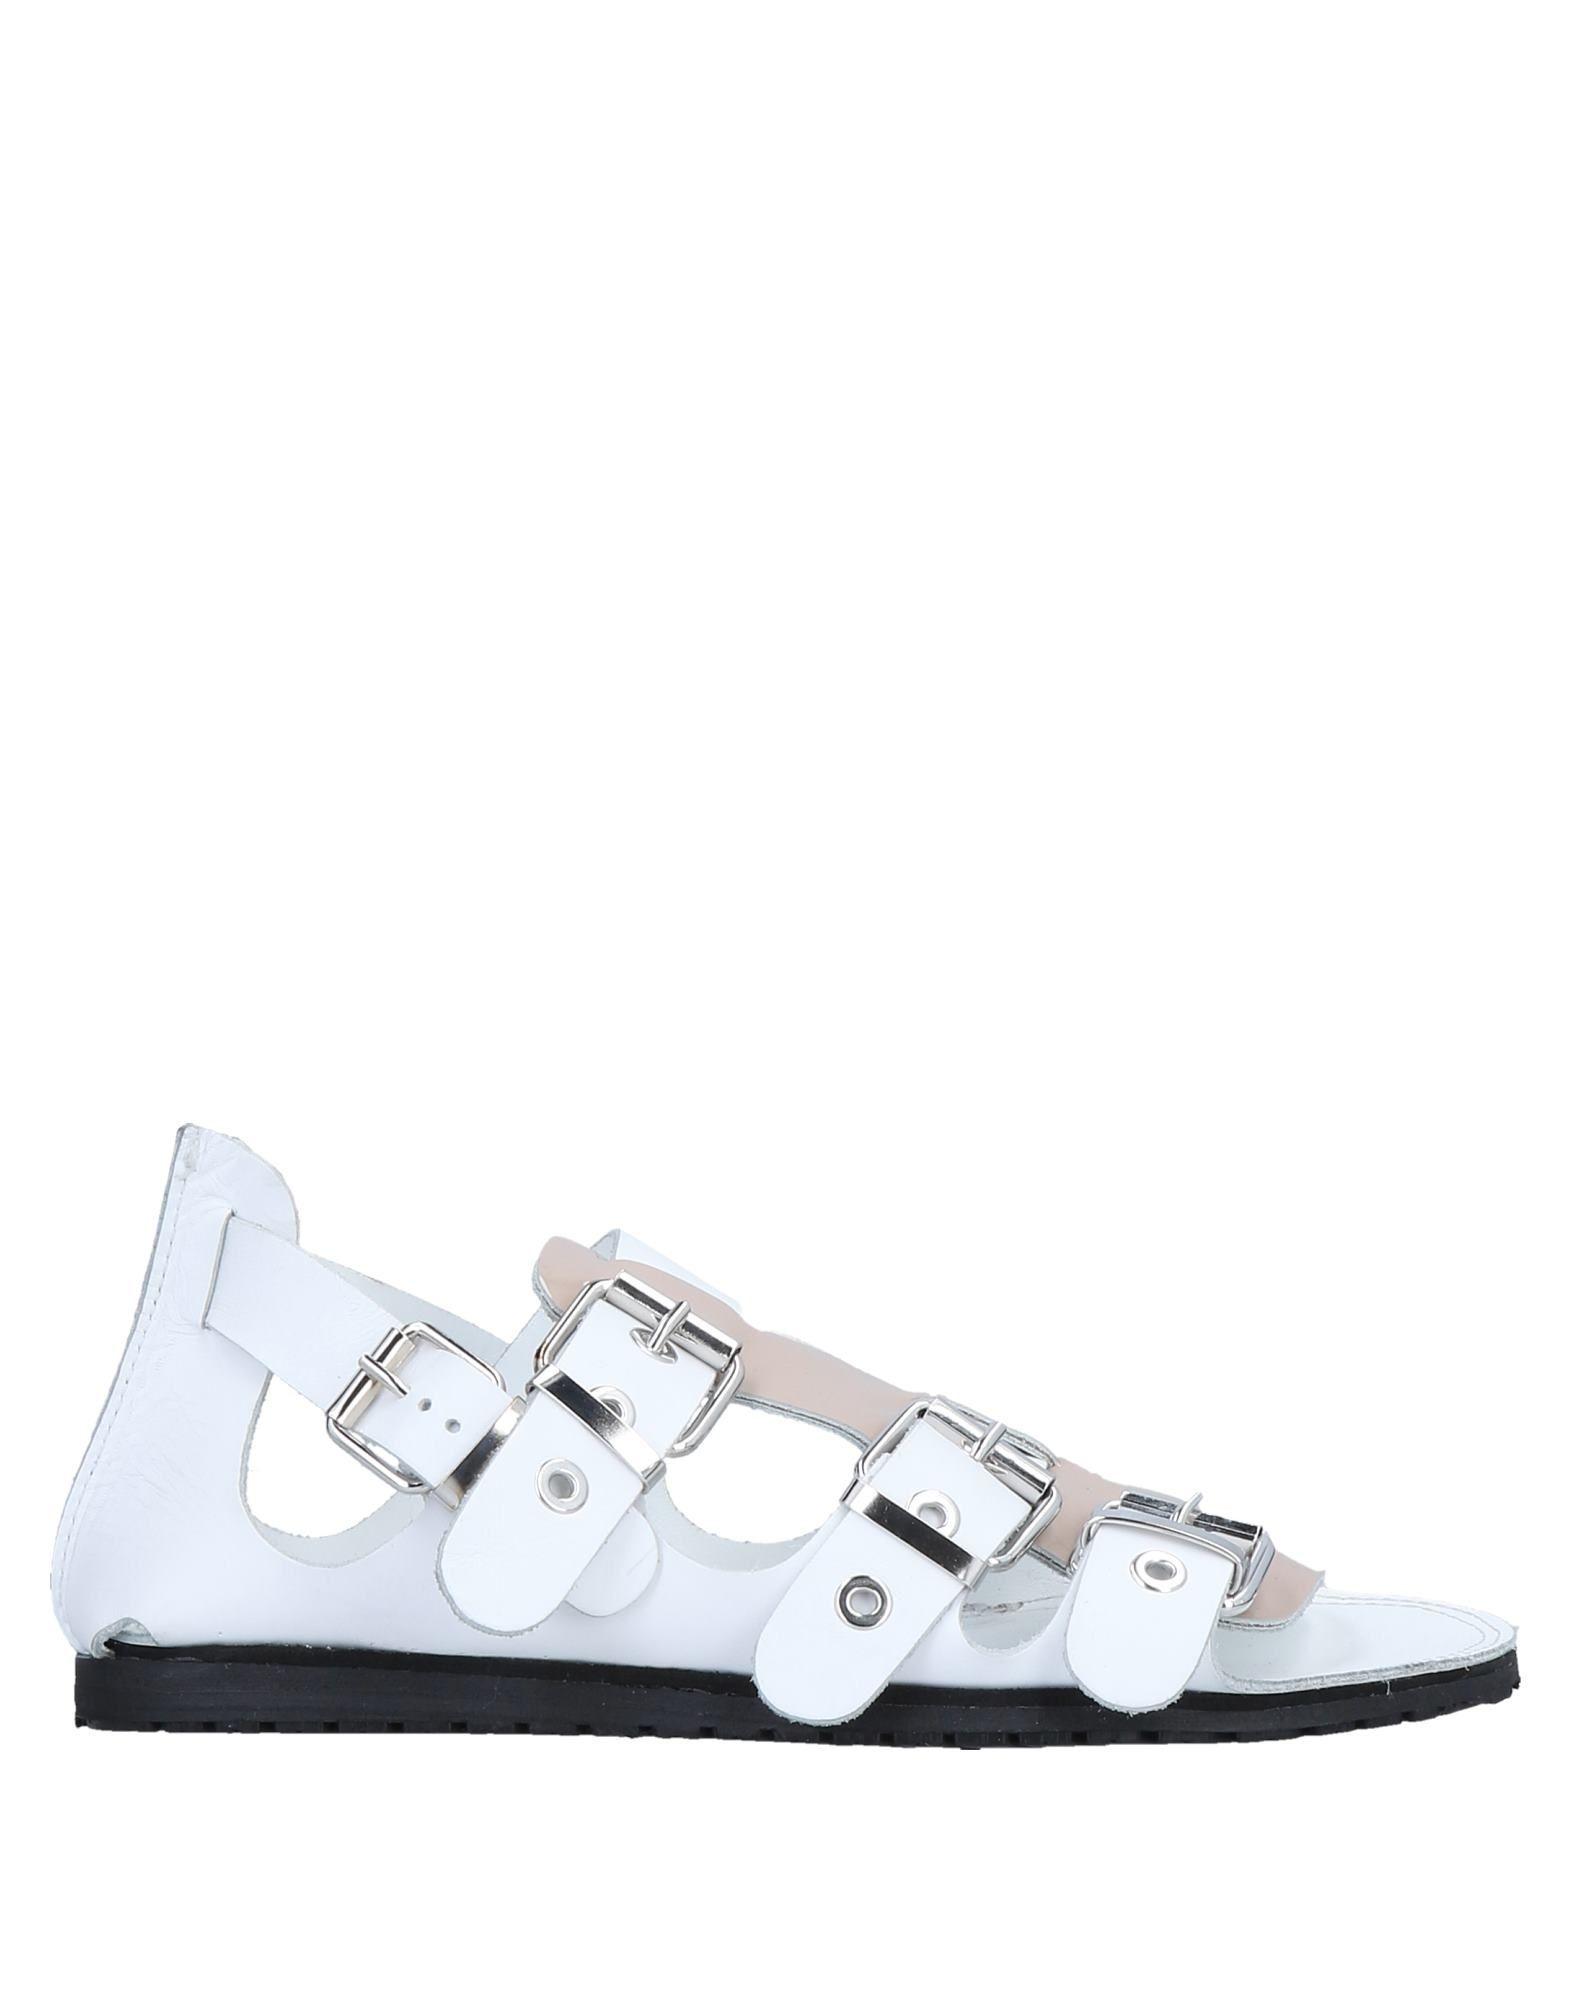 Divine Follie Pale Pink Calf Leather Sandals